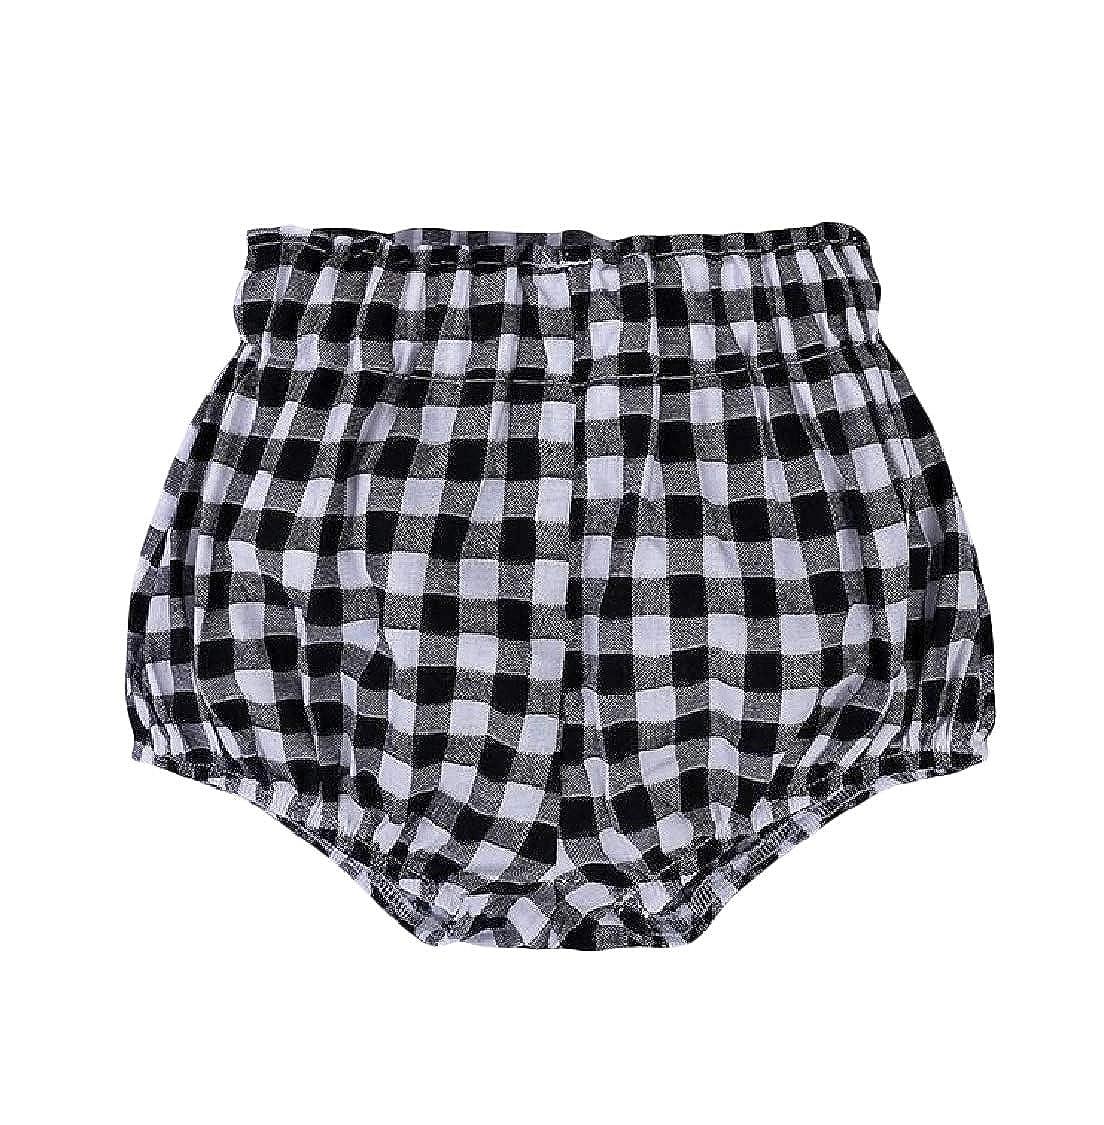 Pandapang Girls Casual Corduroy Elastic Waist Cute Boys Short